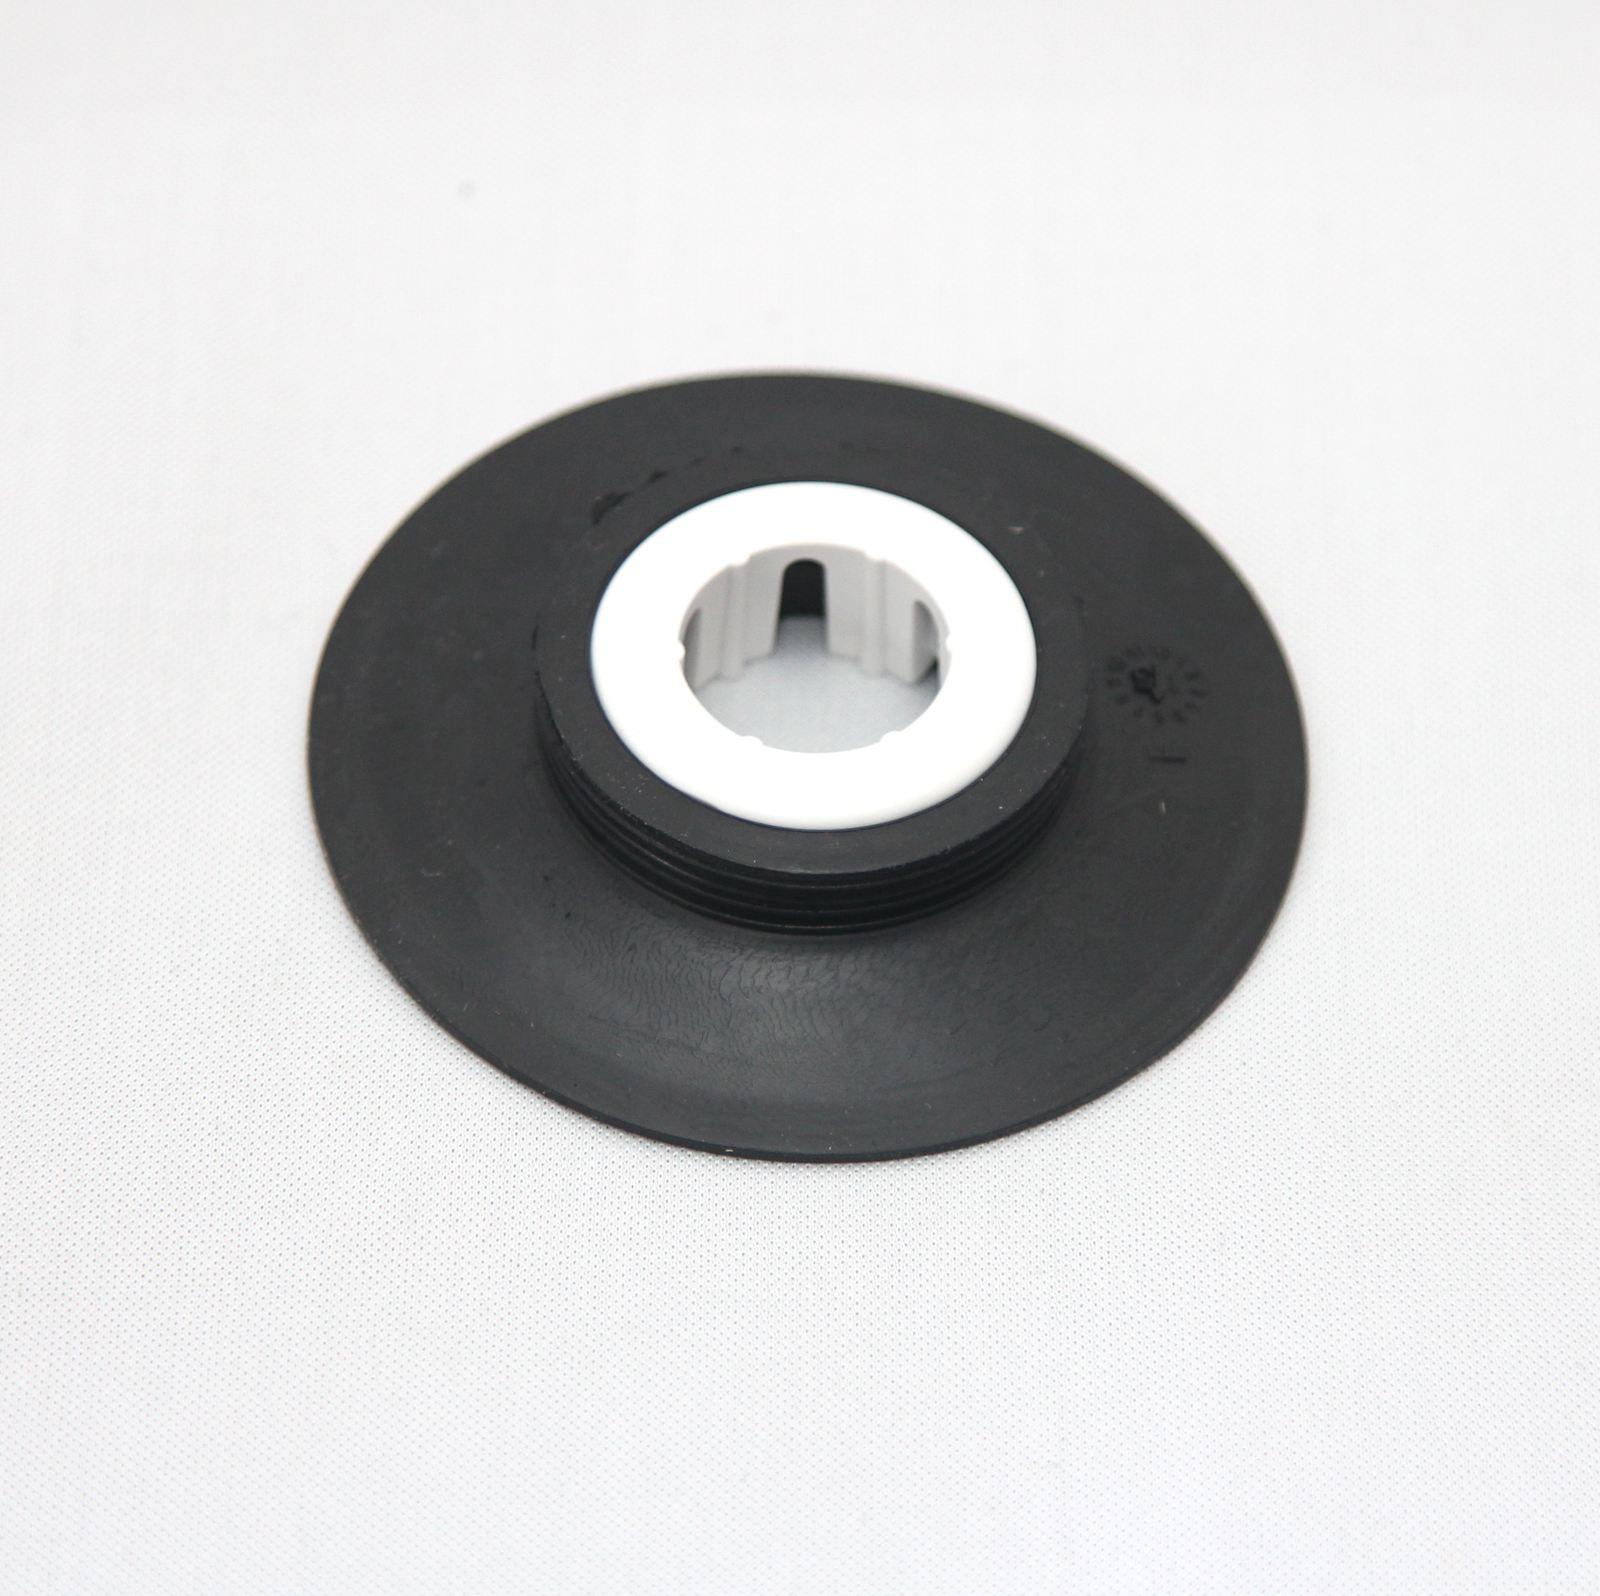 Buy Ideal Standard Bathroom Accessories Fittings Furniture Ebay Refit Active Single Mono Faucet Sv01967 Dual Flush Valve Diaphragm Seal Clip